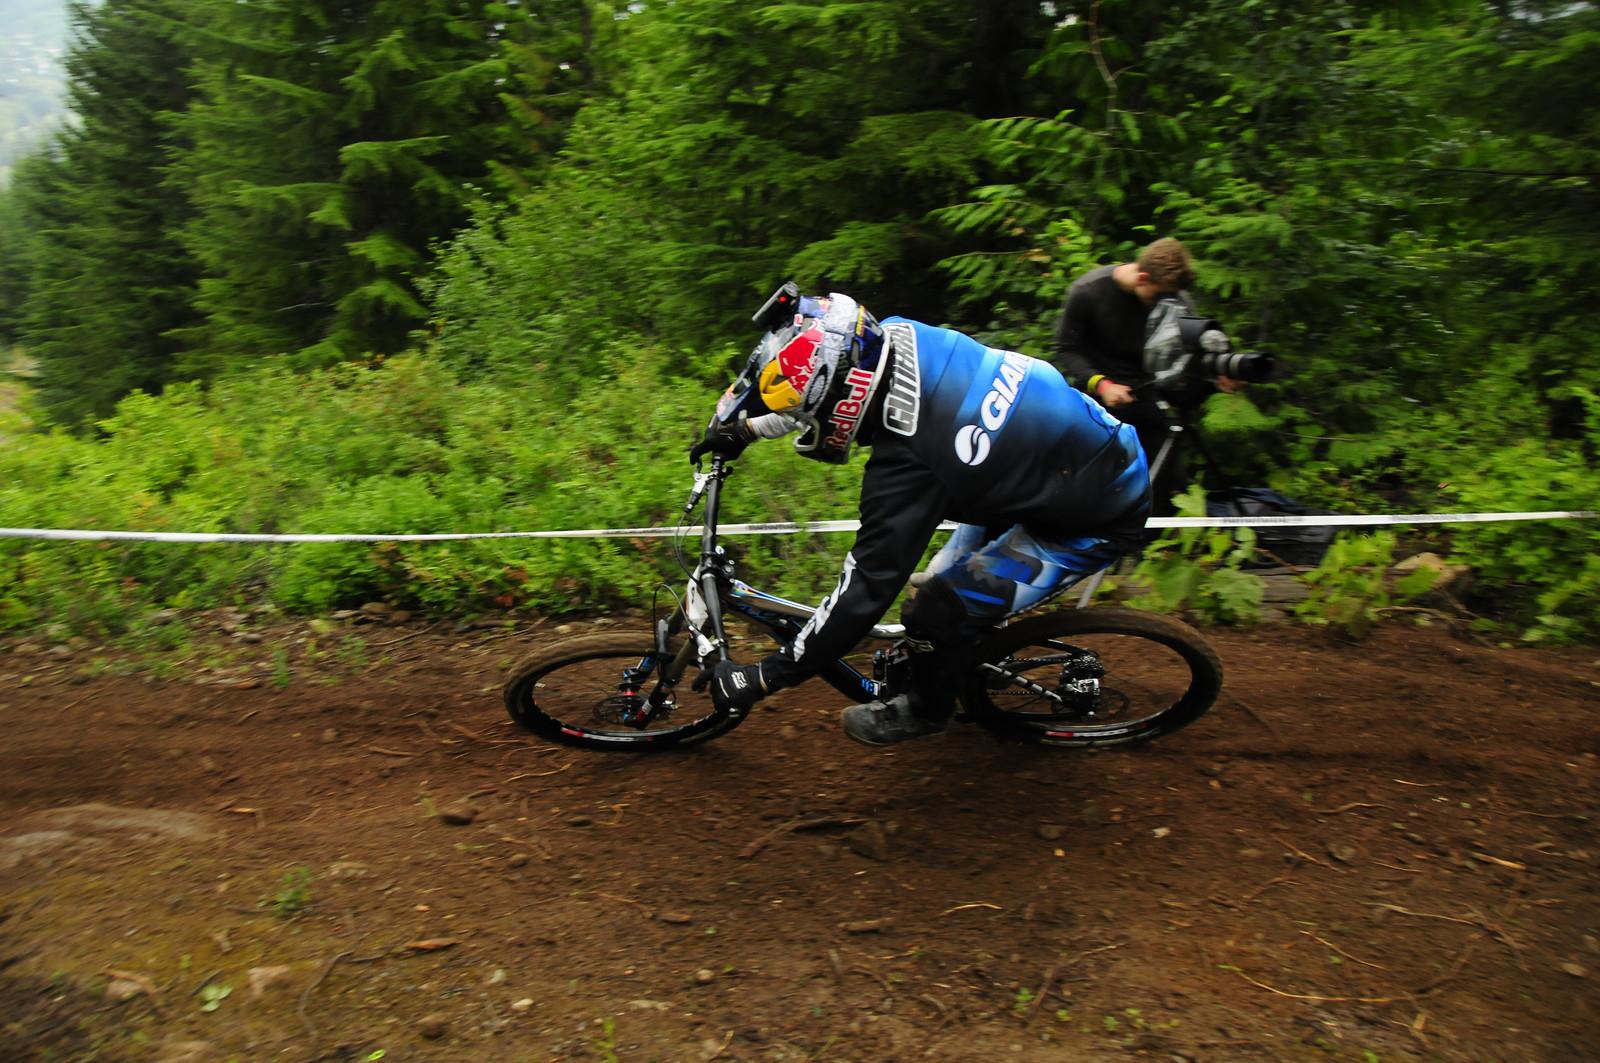 Canadian Open Marcelo Gutierrez - ezefaccio - Mountain Biking Pictures - Vital MTB